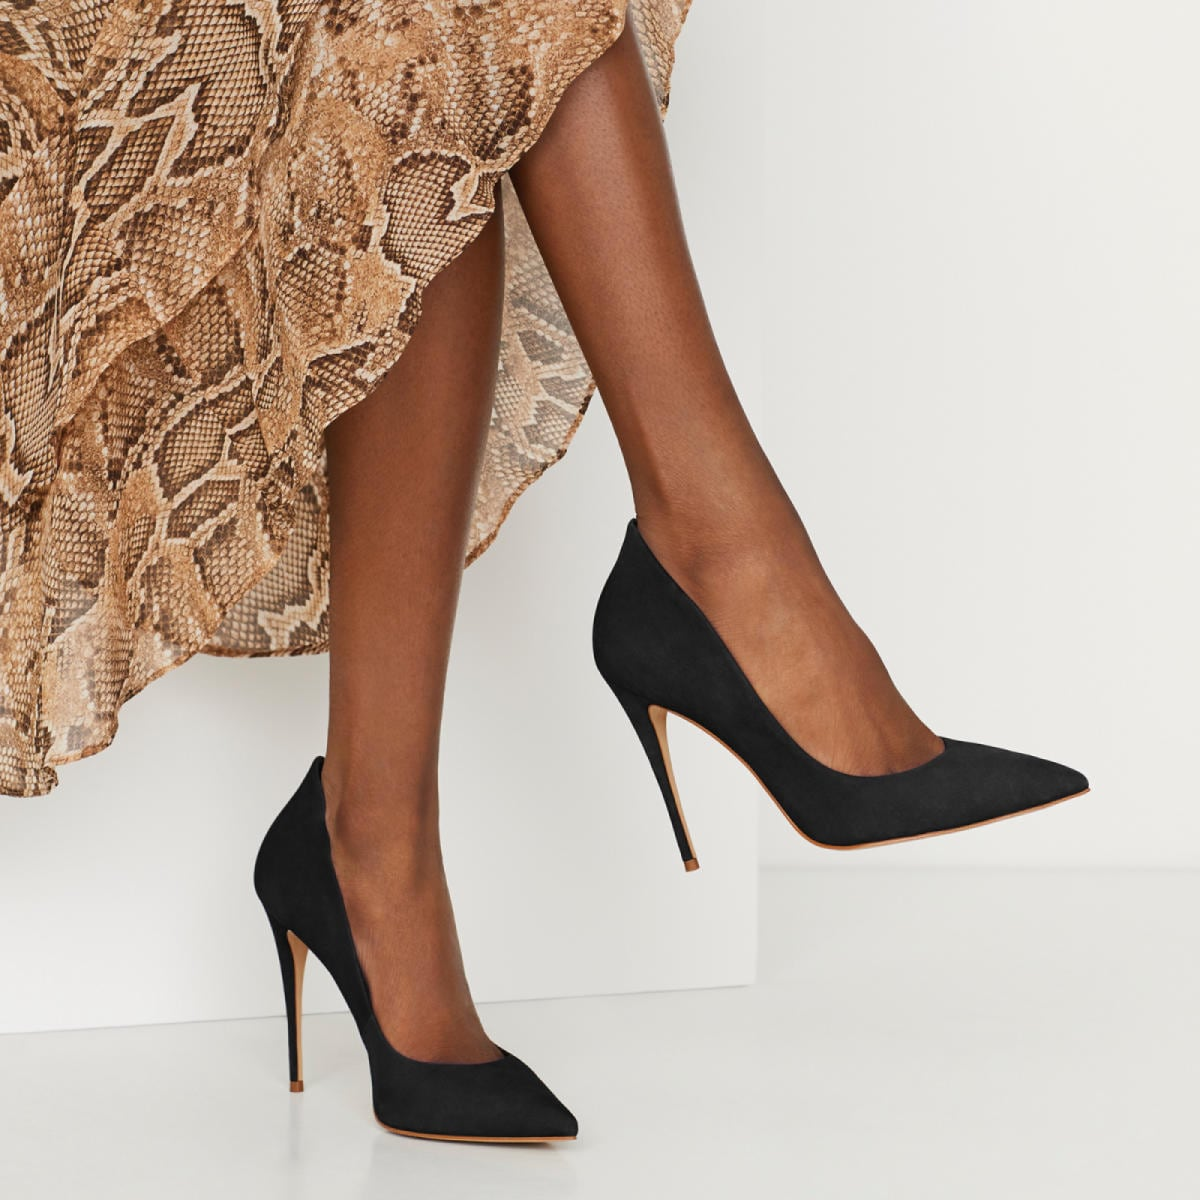 Cassedy Black Leather Nubuck Women's